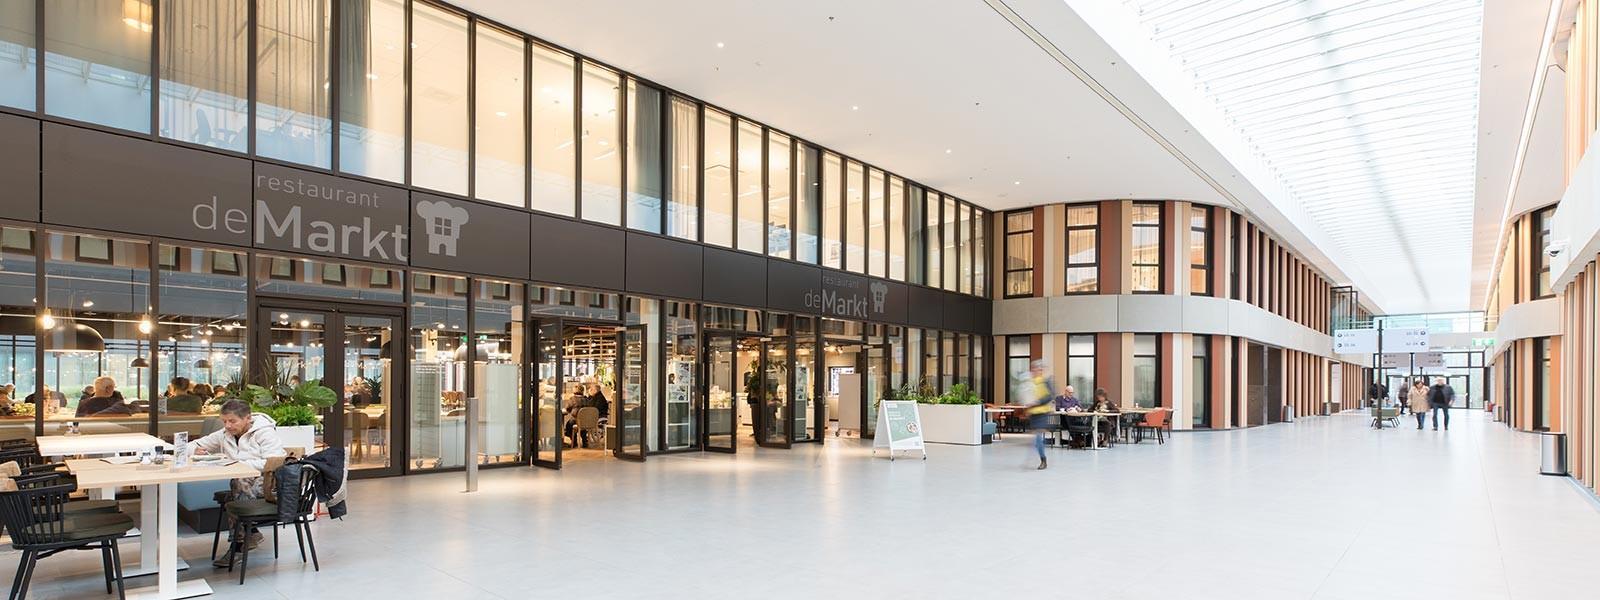 Amphia Ziekenhuis, Breda